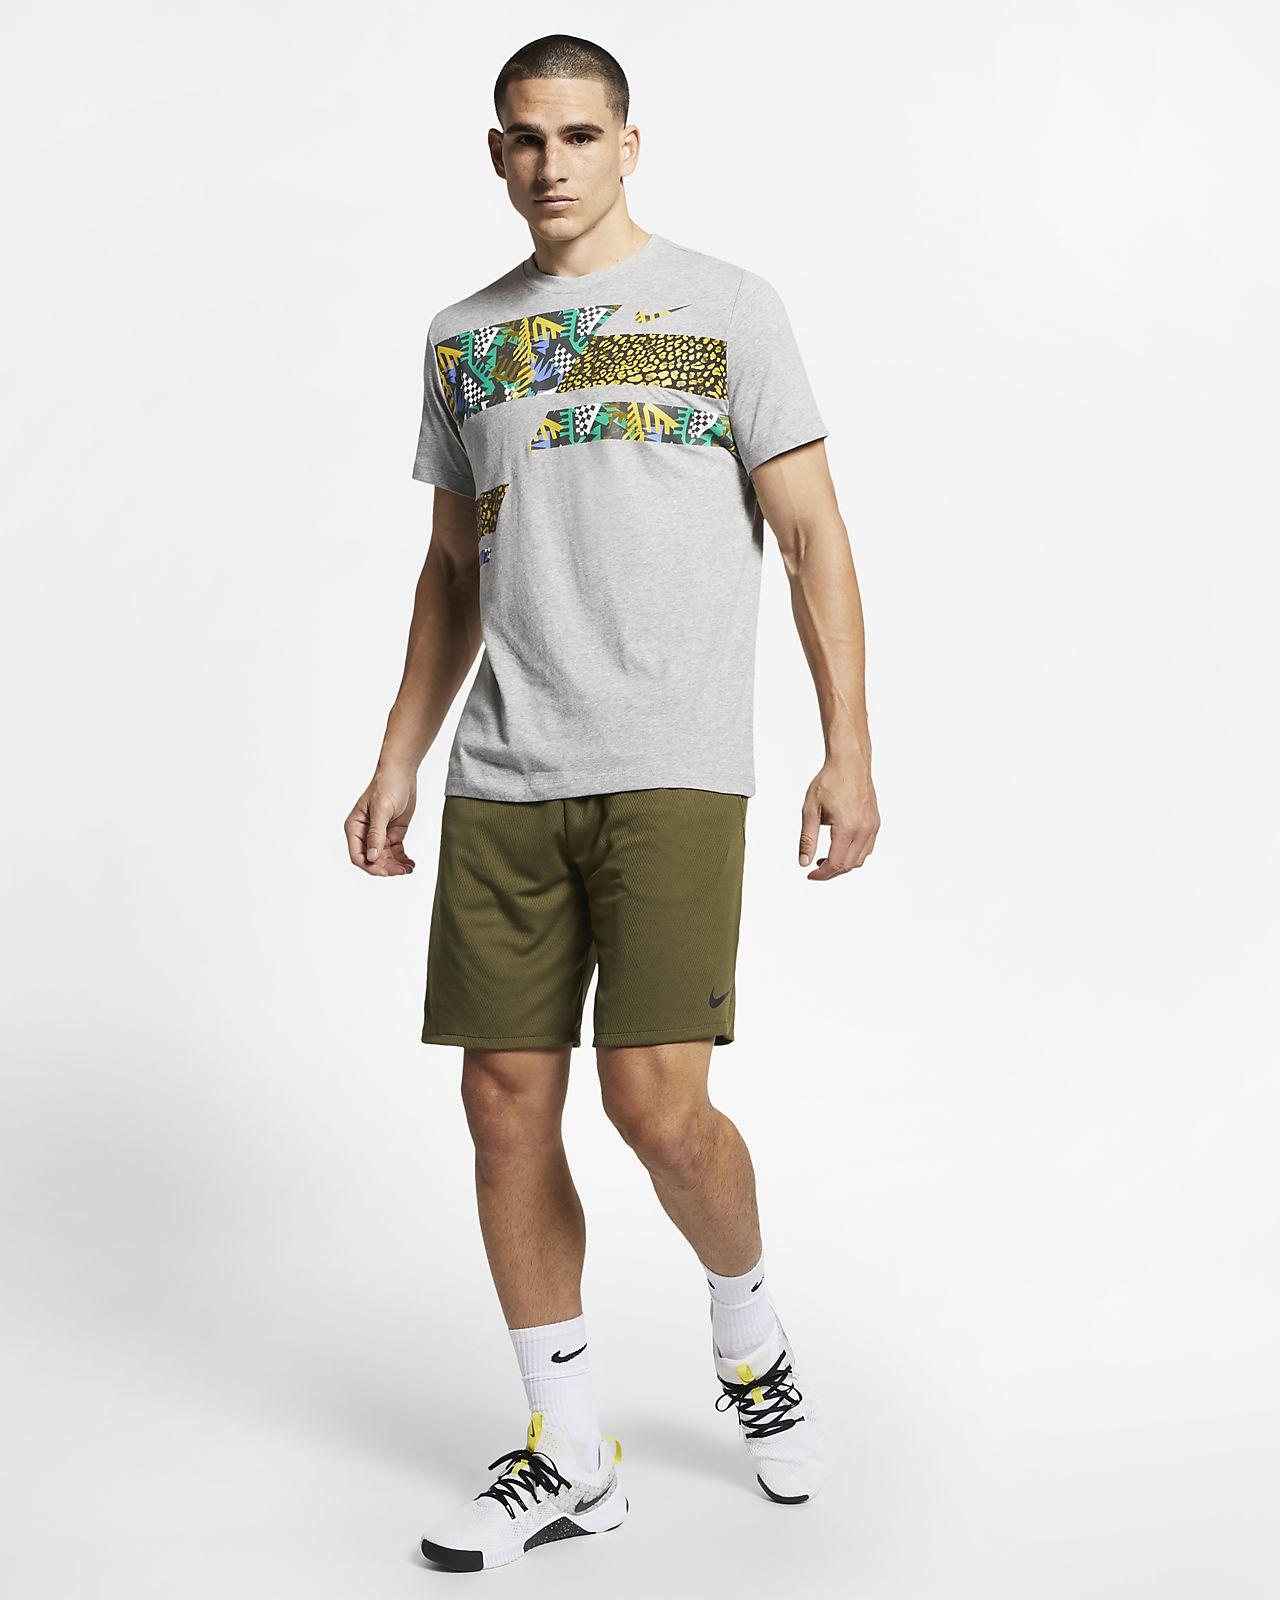 a1ad2bdb1 Nike Dri-FIT Men's Hooded Short-Sleeve T-Shirt. Nike.com